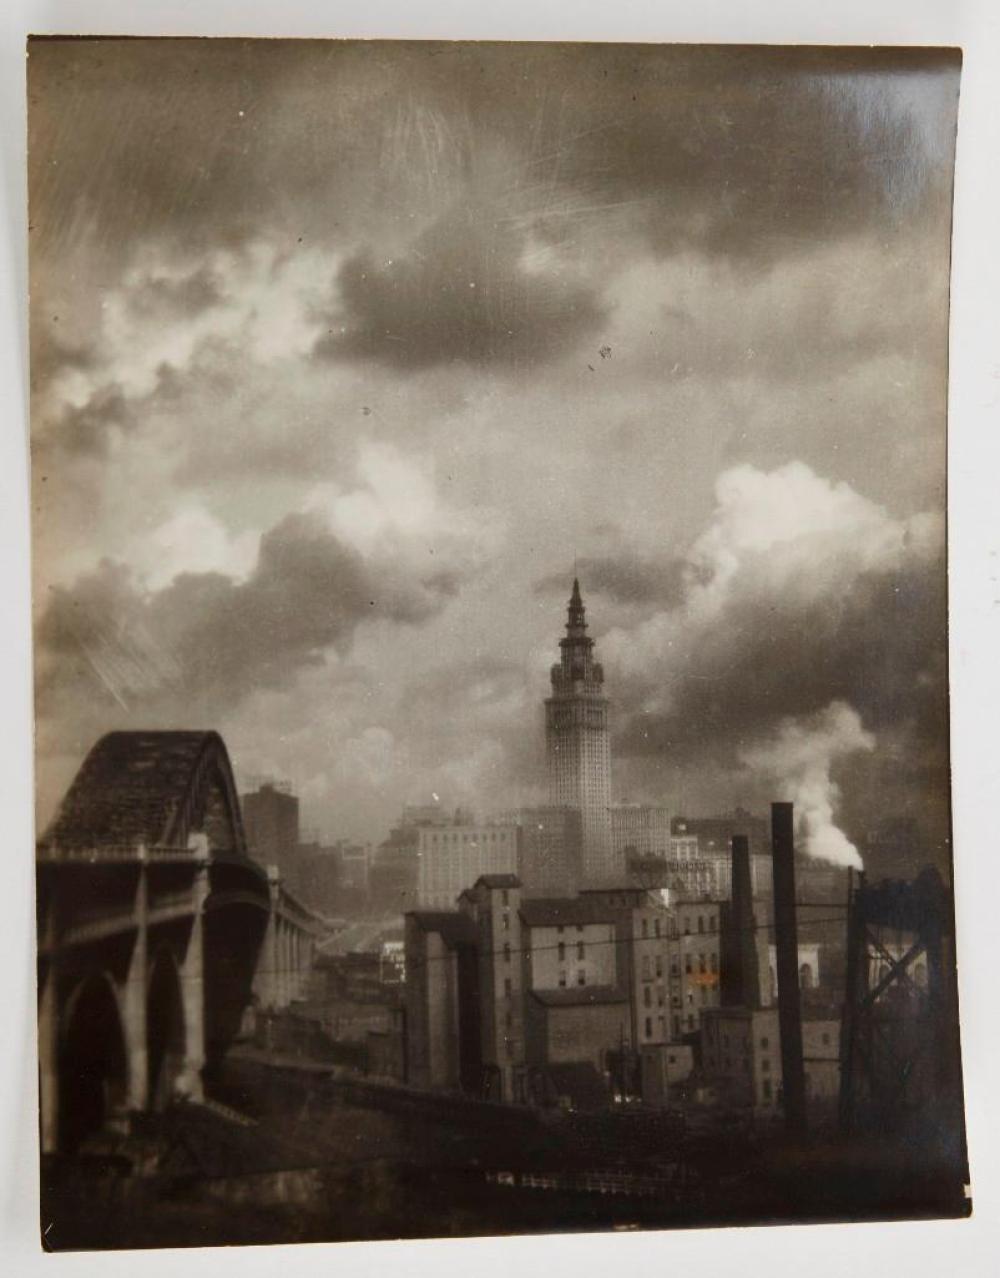 Margaret Bourke White - 4 photographs Photos